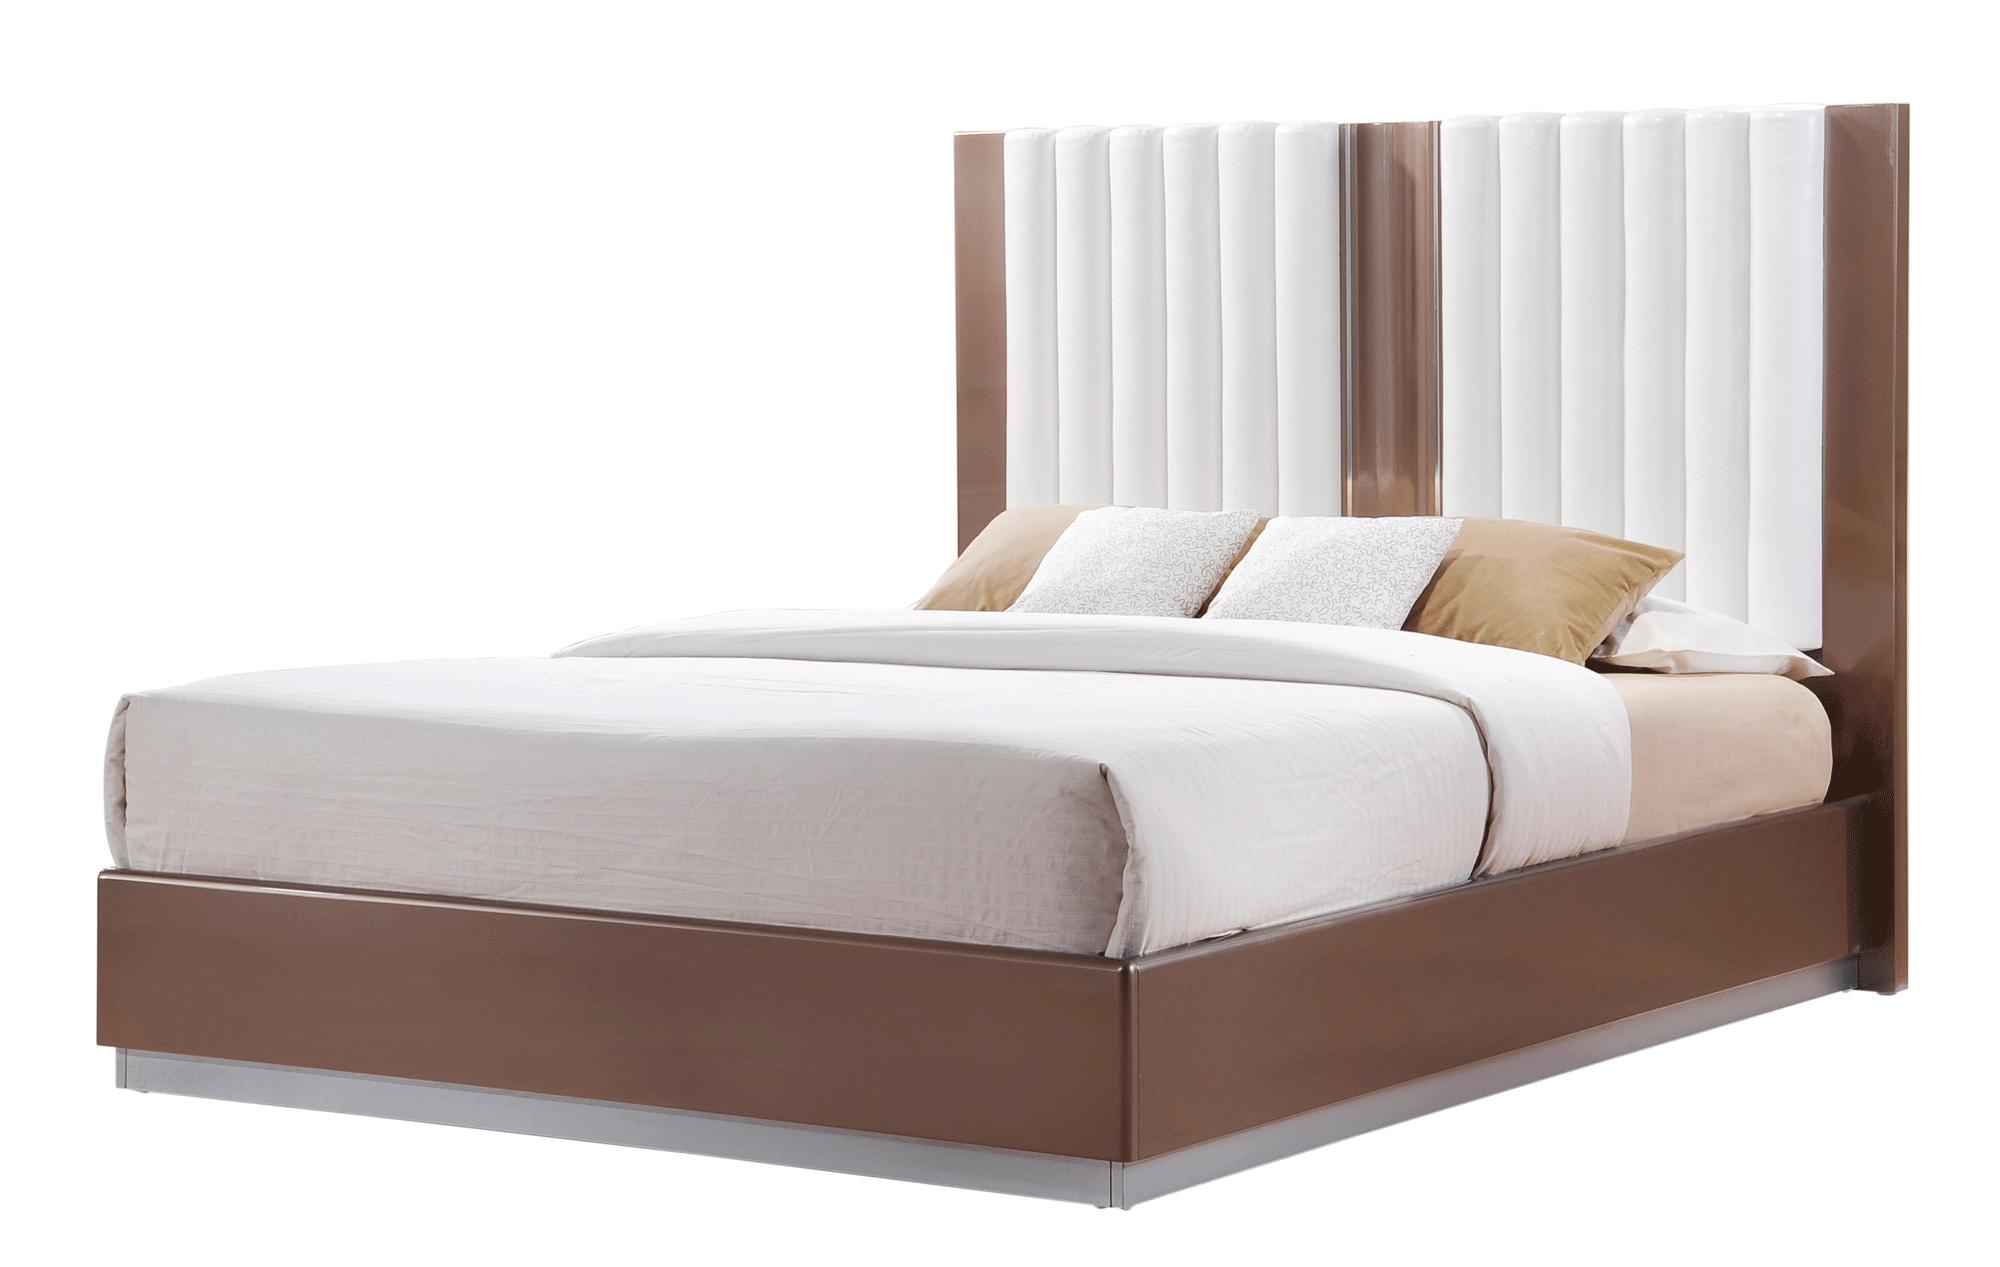 Brooklyn Brown Light Glossy Bedroom Set by Global Furniture